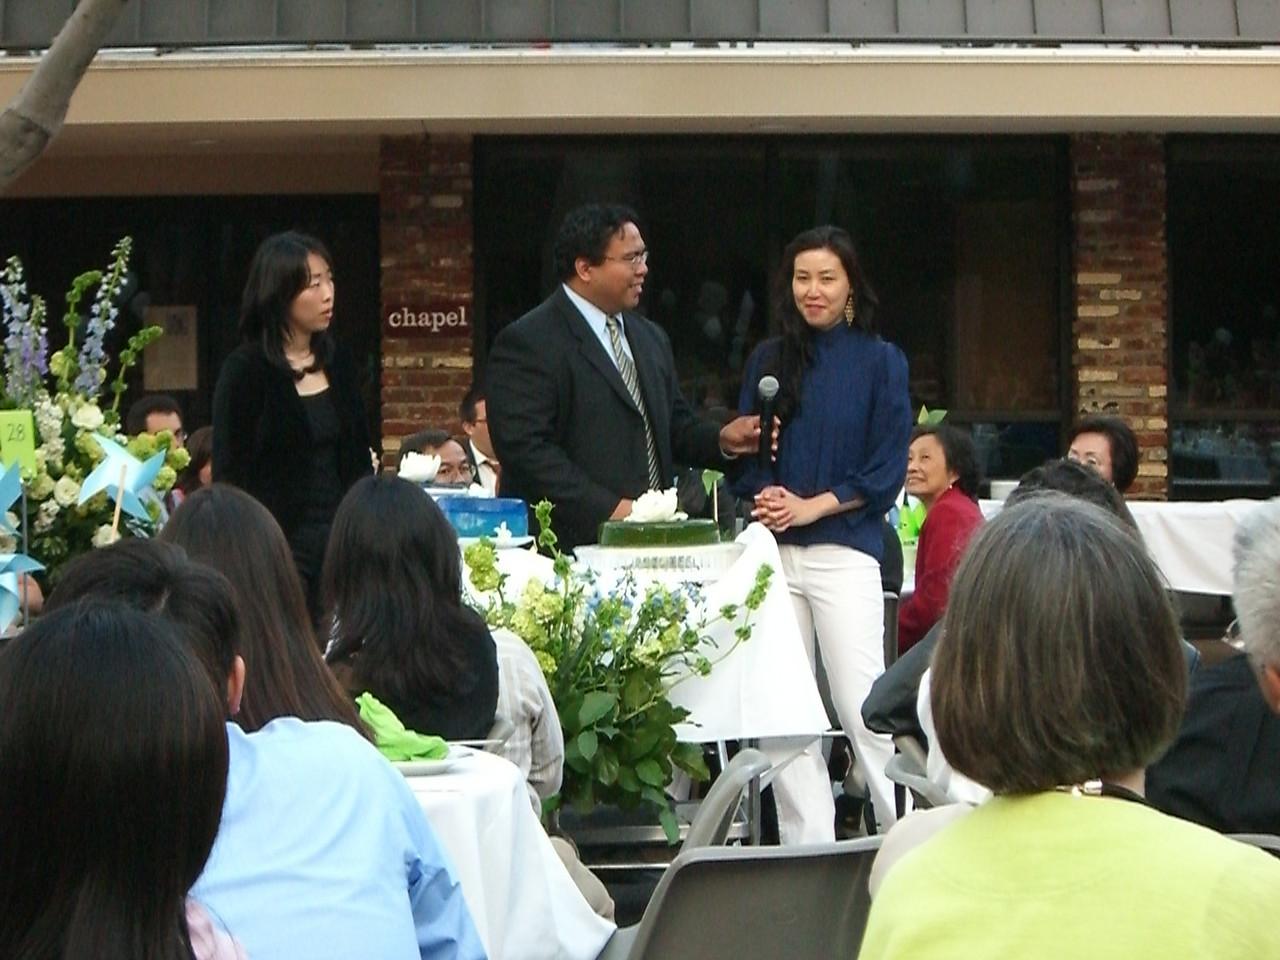 2006 05 06 Sat - MC Jon helps explain the Jello wedding cake 2